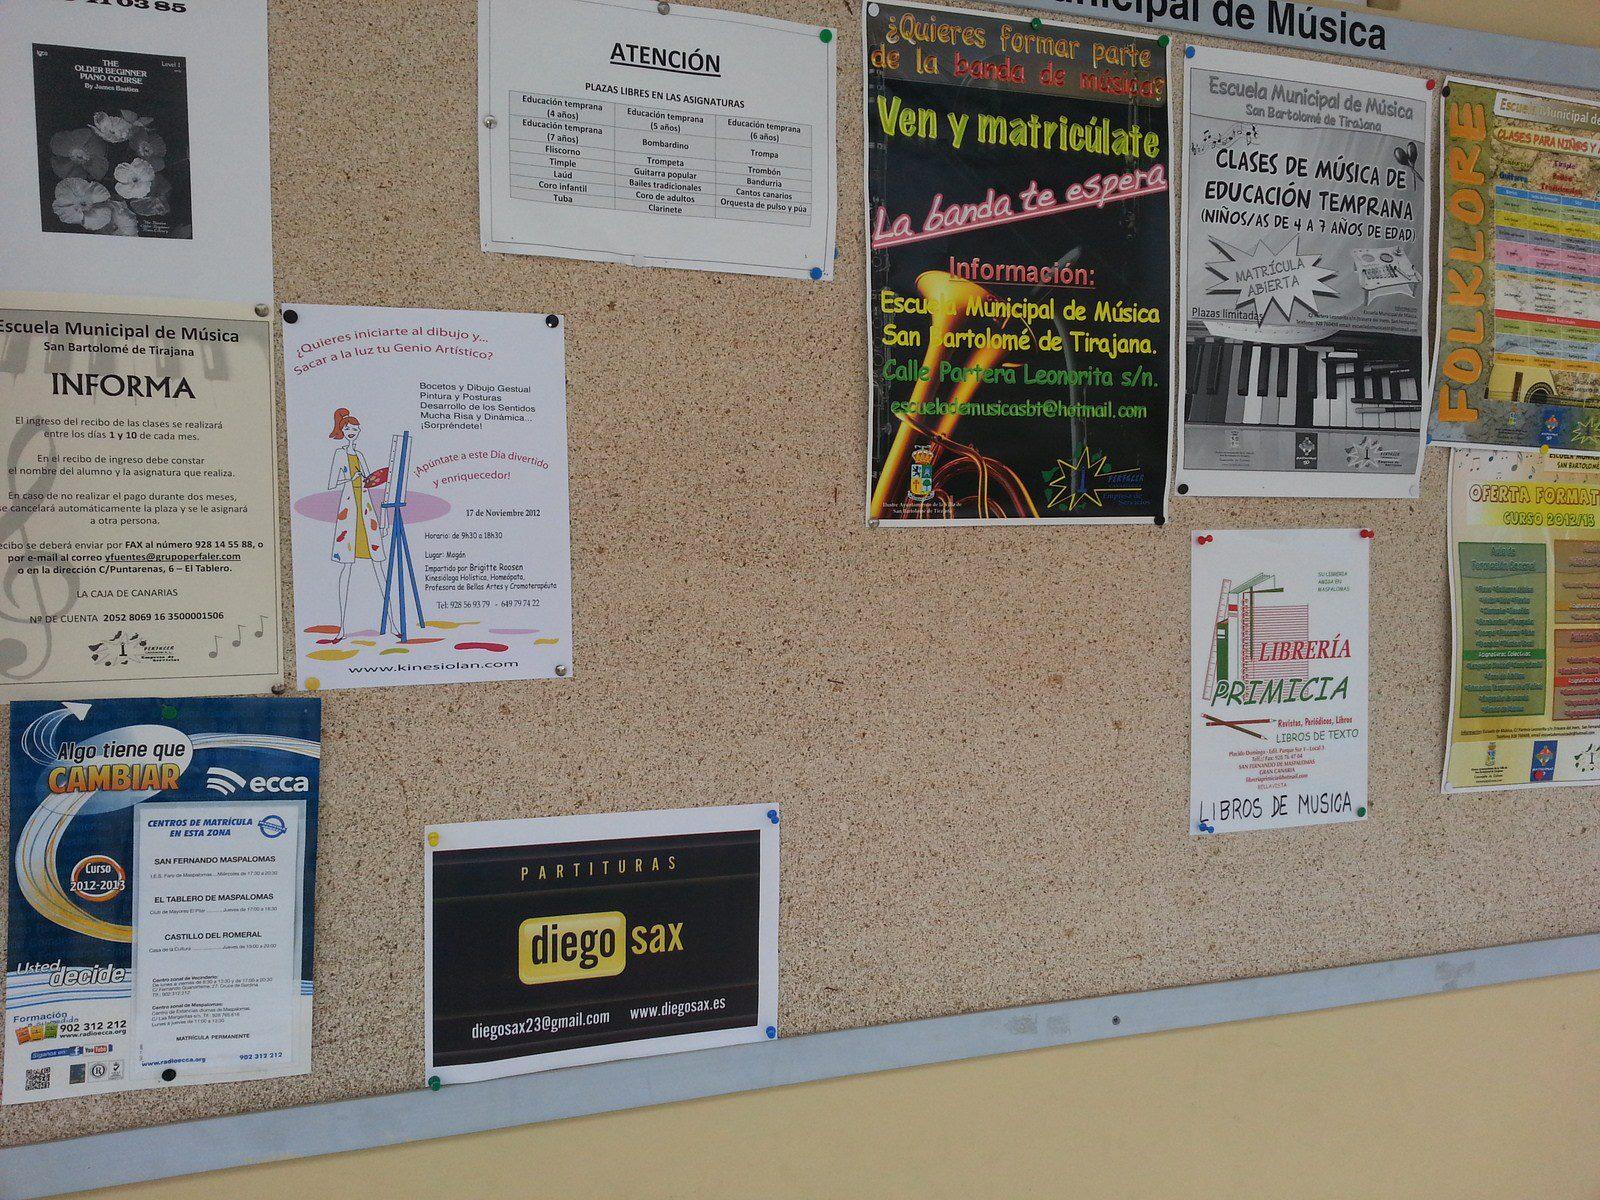 http://4.bp.blogspot.com/-3QfeJcOllDA/UJlCmXLwTxI/AAAAAAAAI5o/nR6GYvX9NvI/s1600/diegosax+publicado+en+La+Escuela+de+Mu%CC%81sica+San+Bartolome%CC%81+Tirajana+por+Santiago.jpg